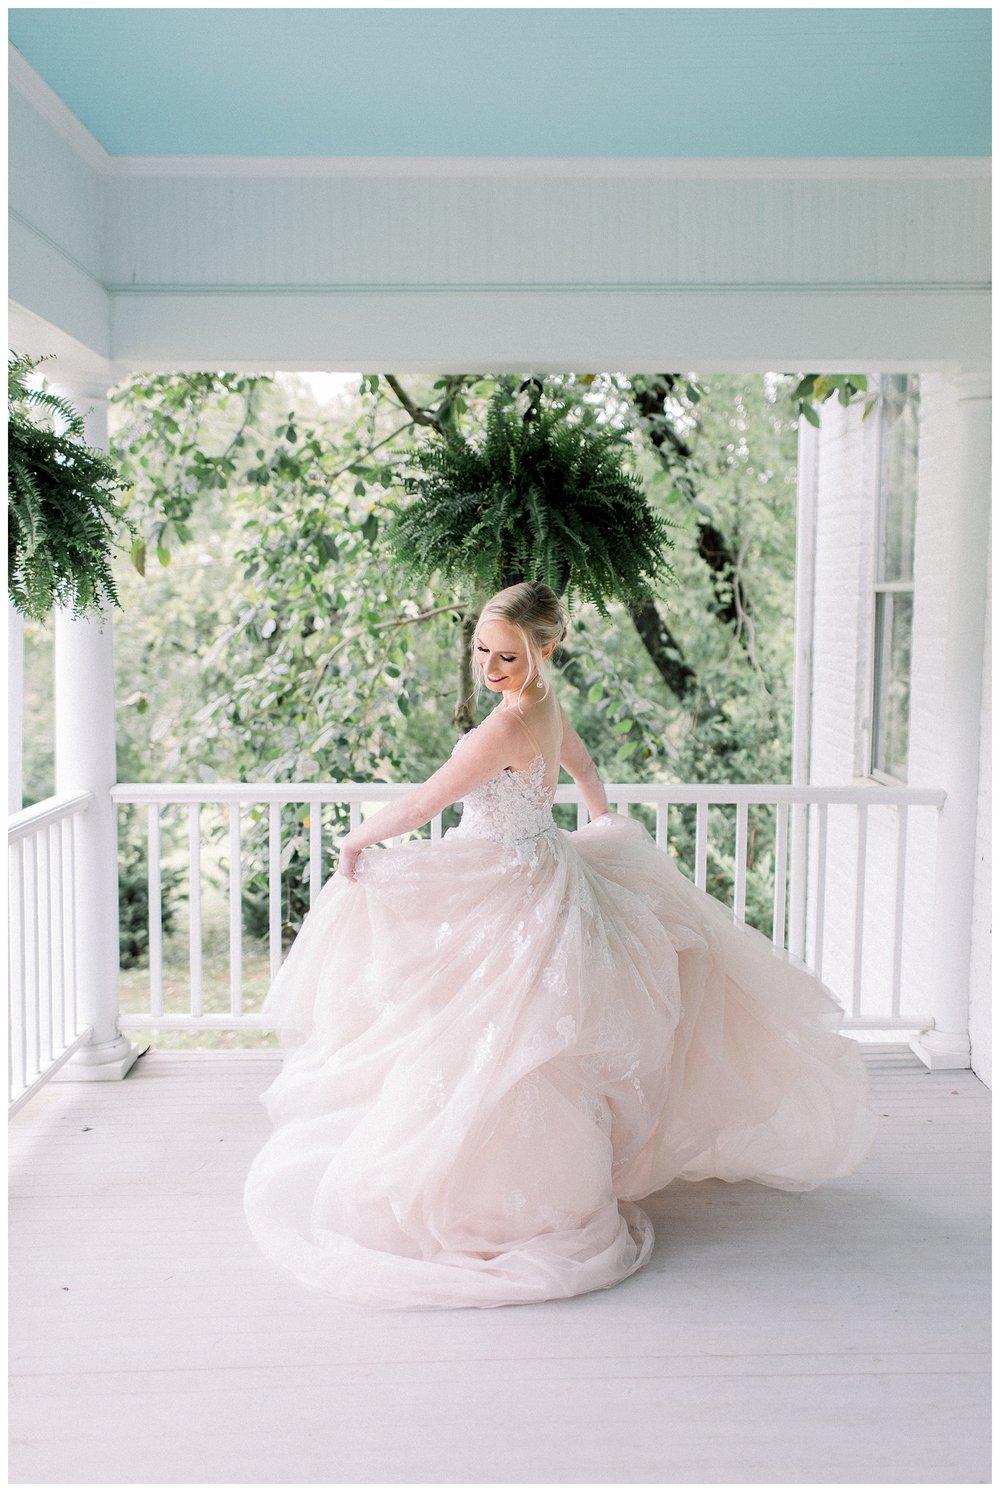 Whitehall Estate Wedding | Northern Virginia Wedding Photographer Kir Tuben_0041.jpg